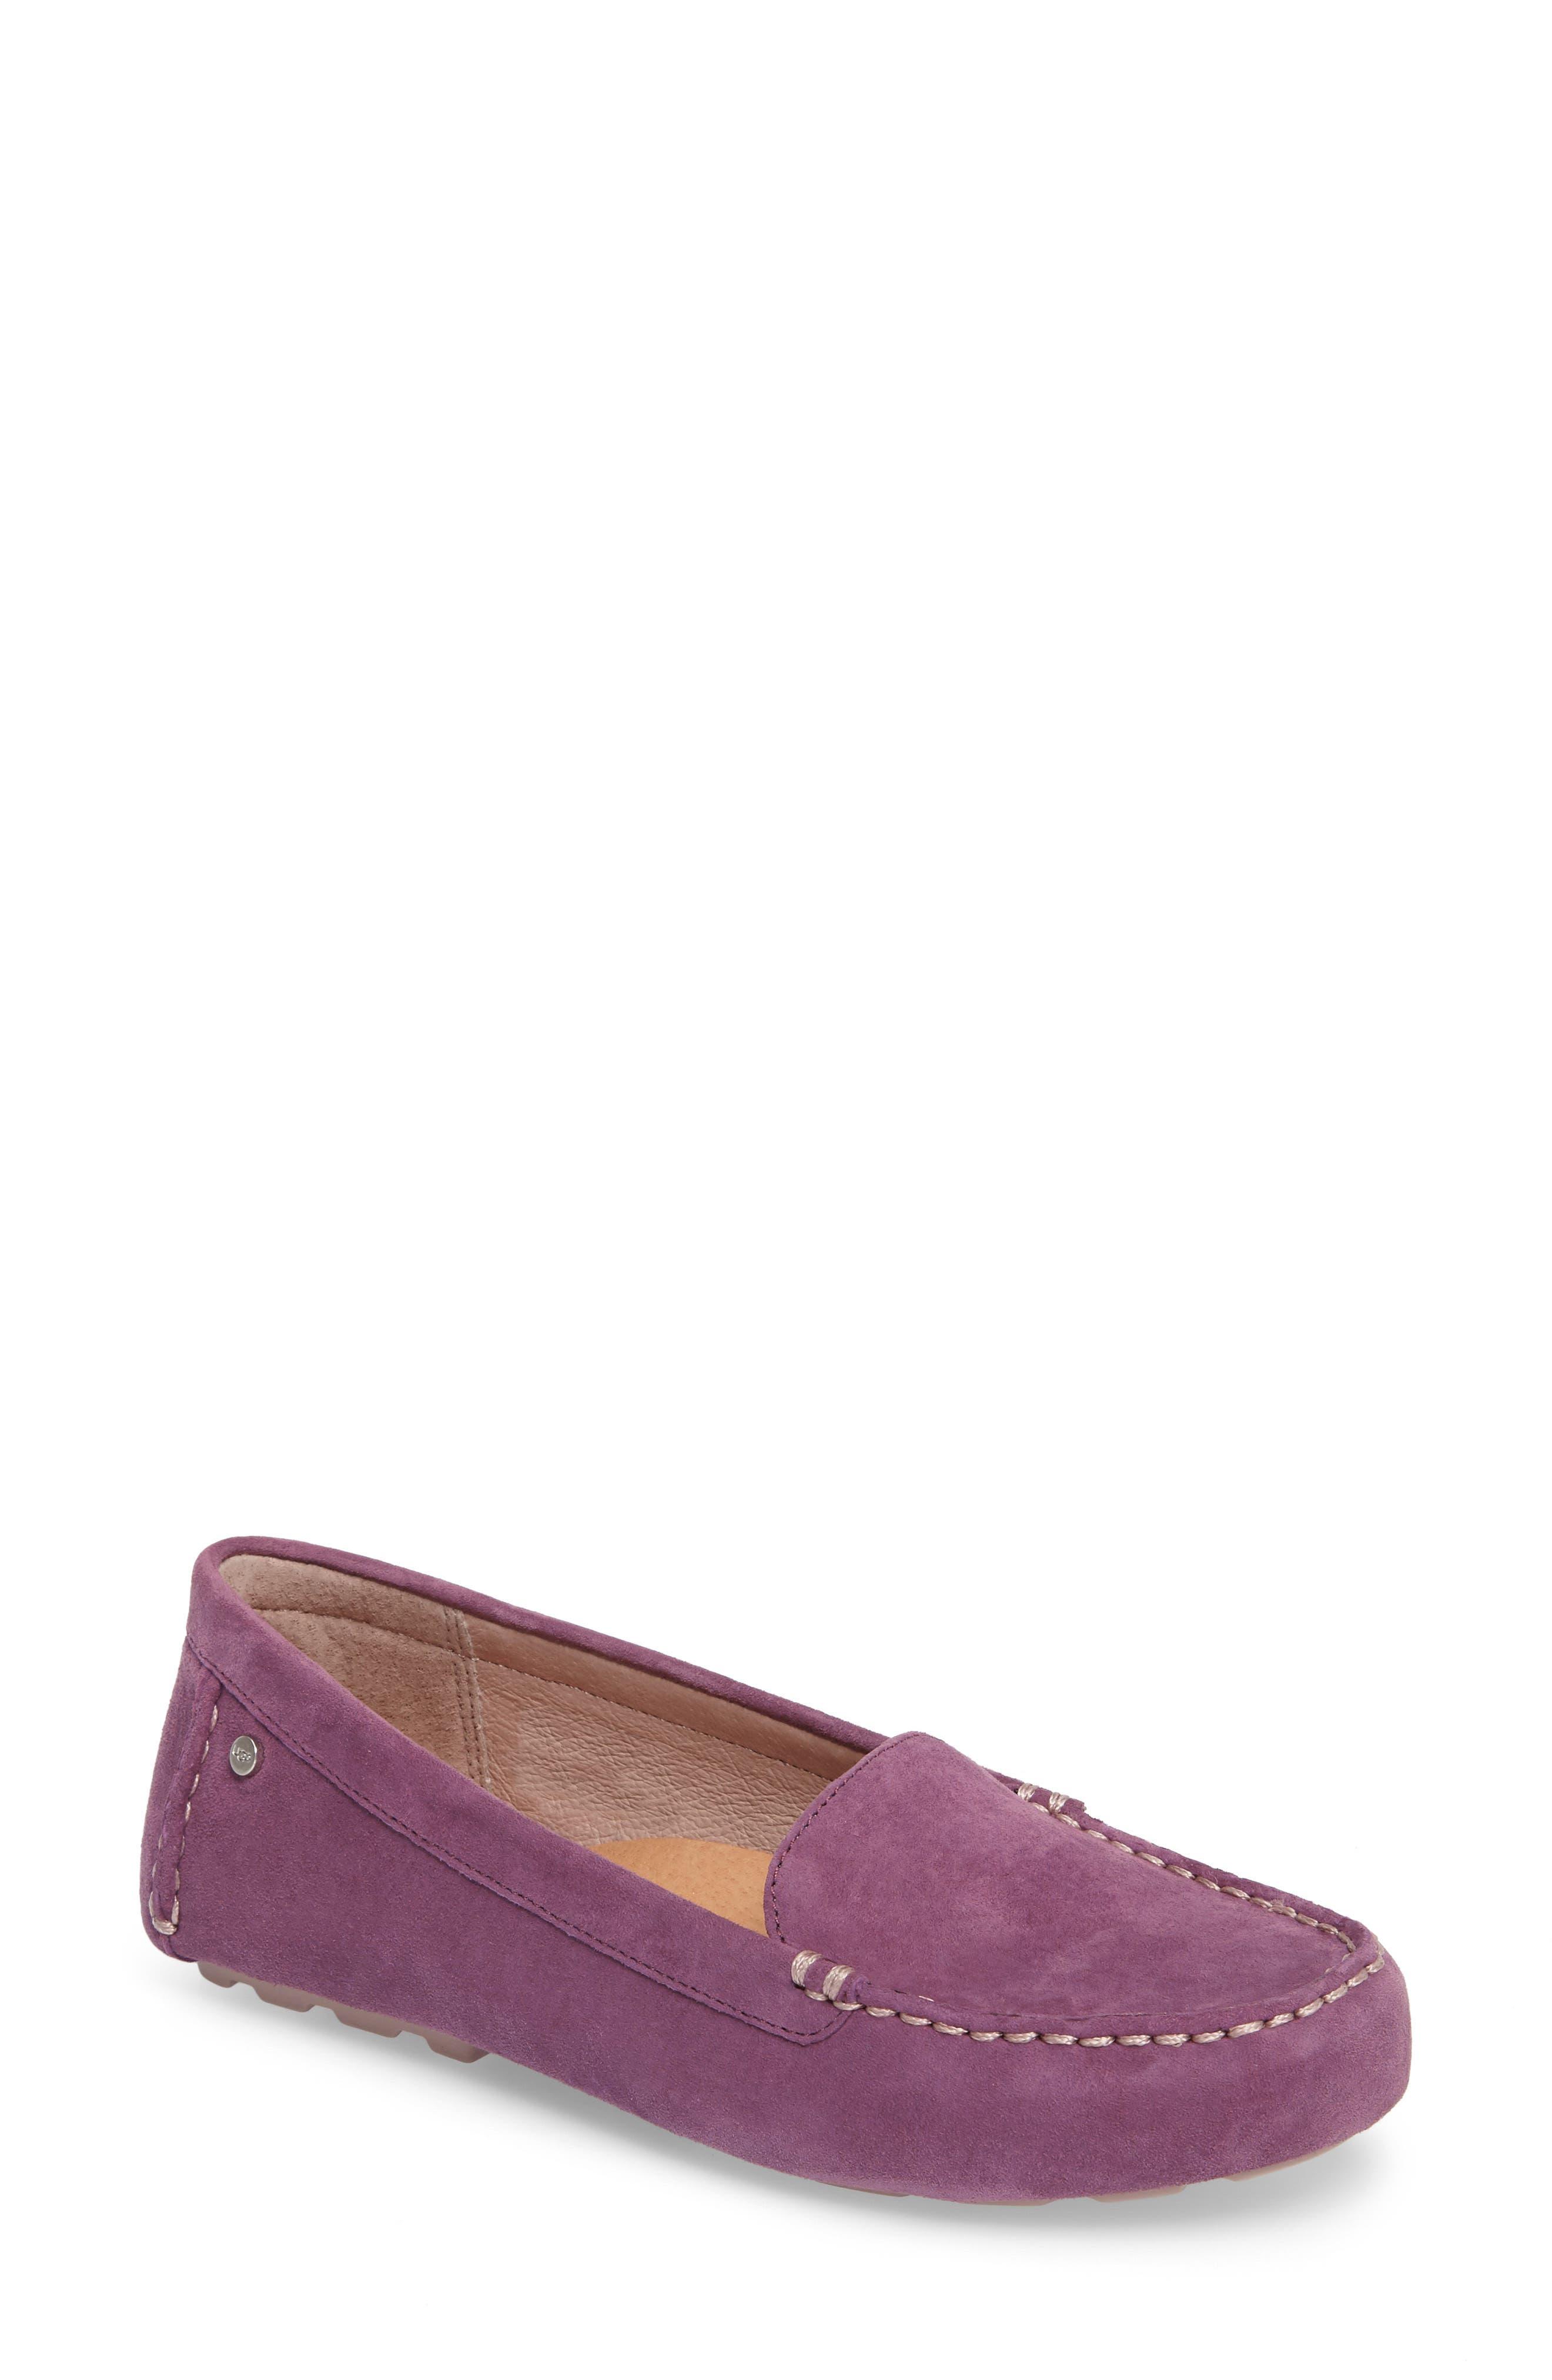 Main Image - UGG® Milana Moc Toe Flat (Women)